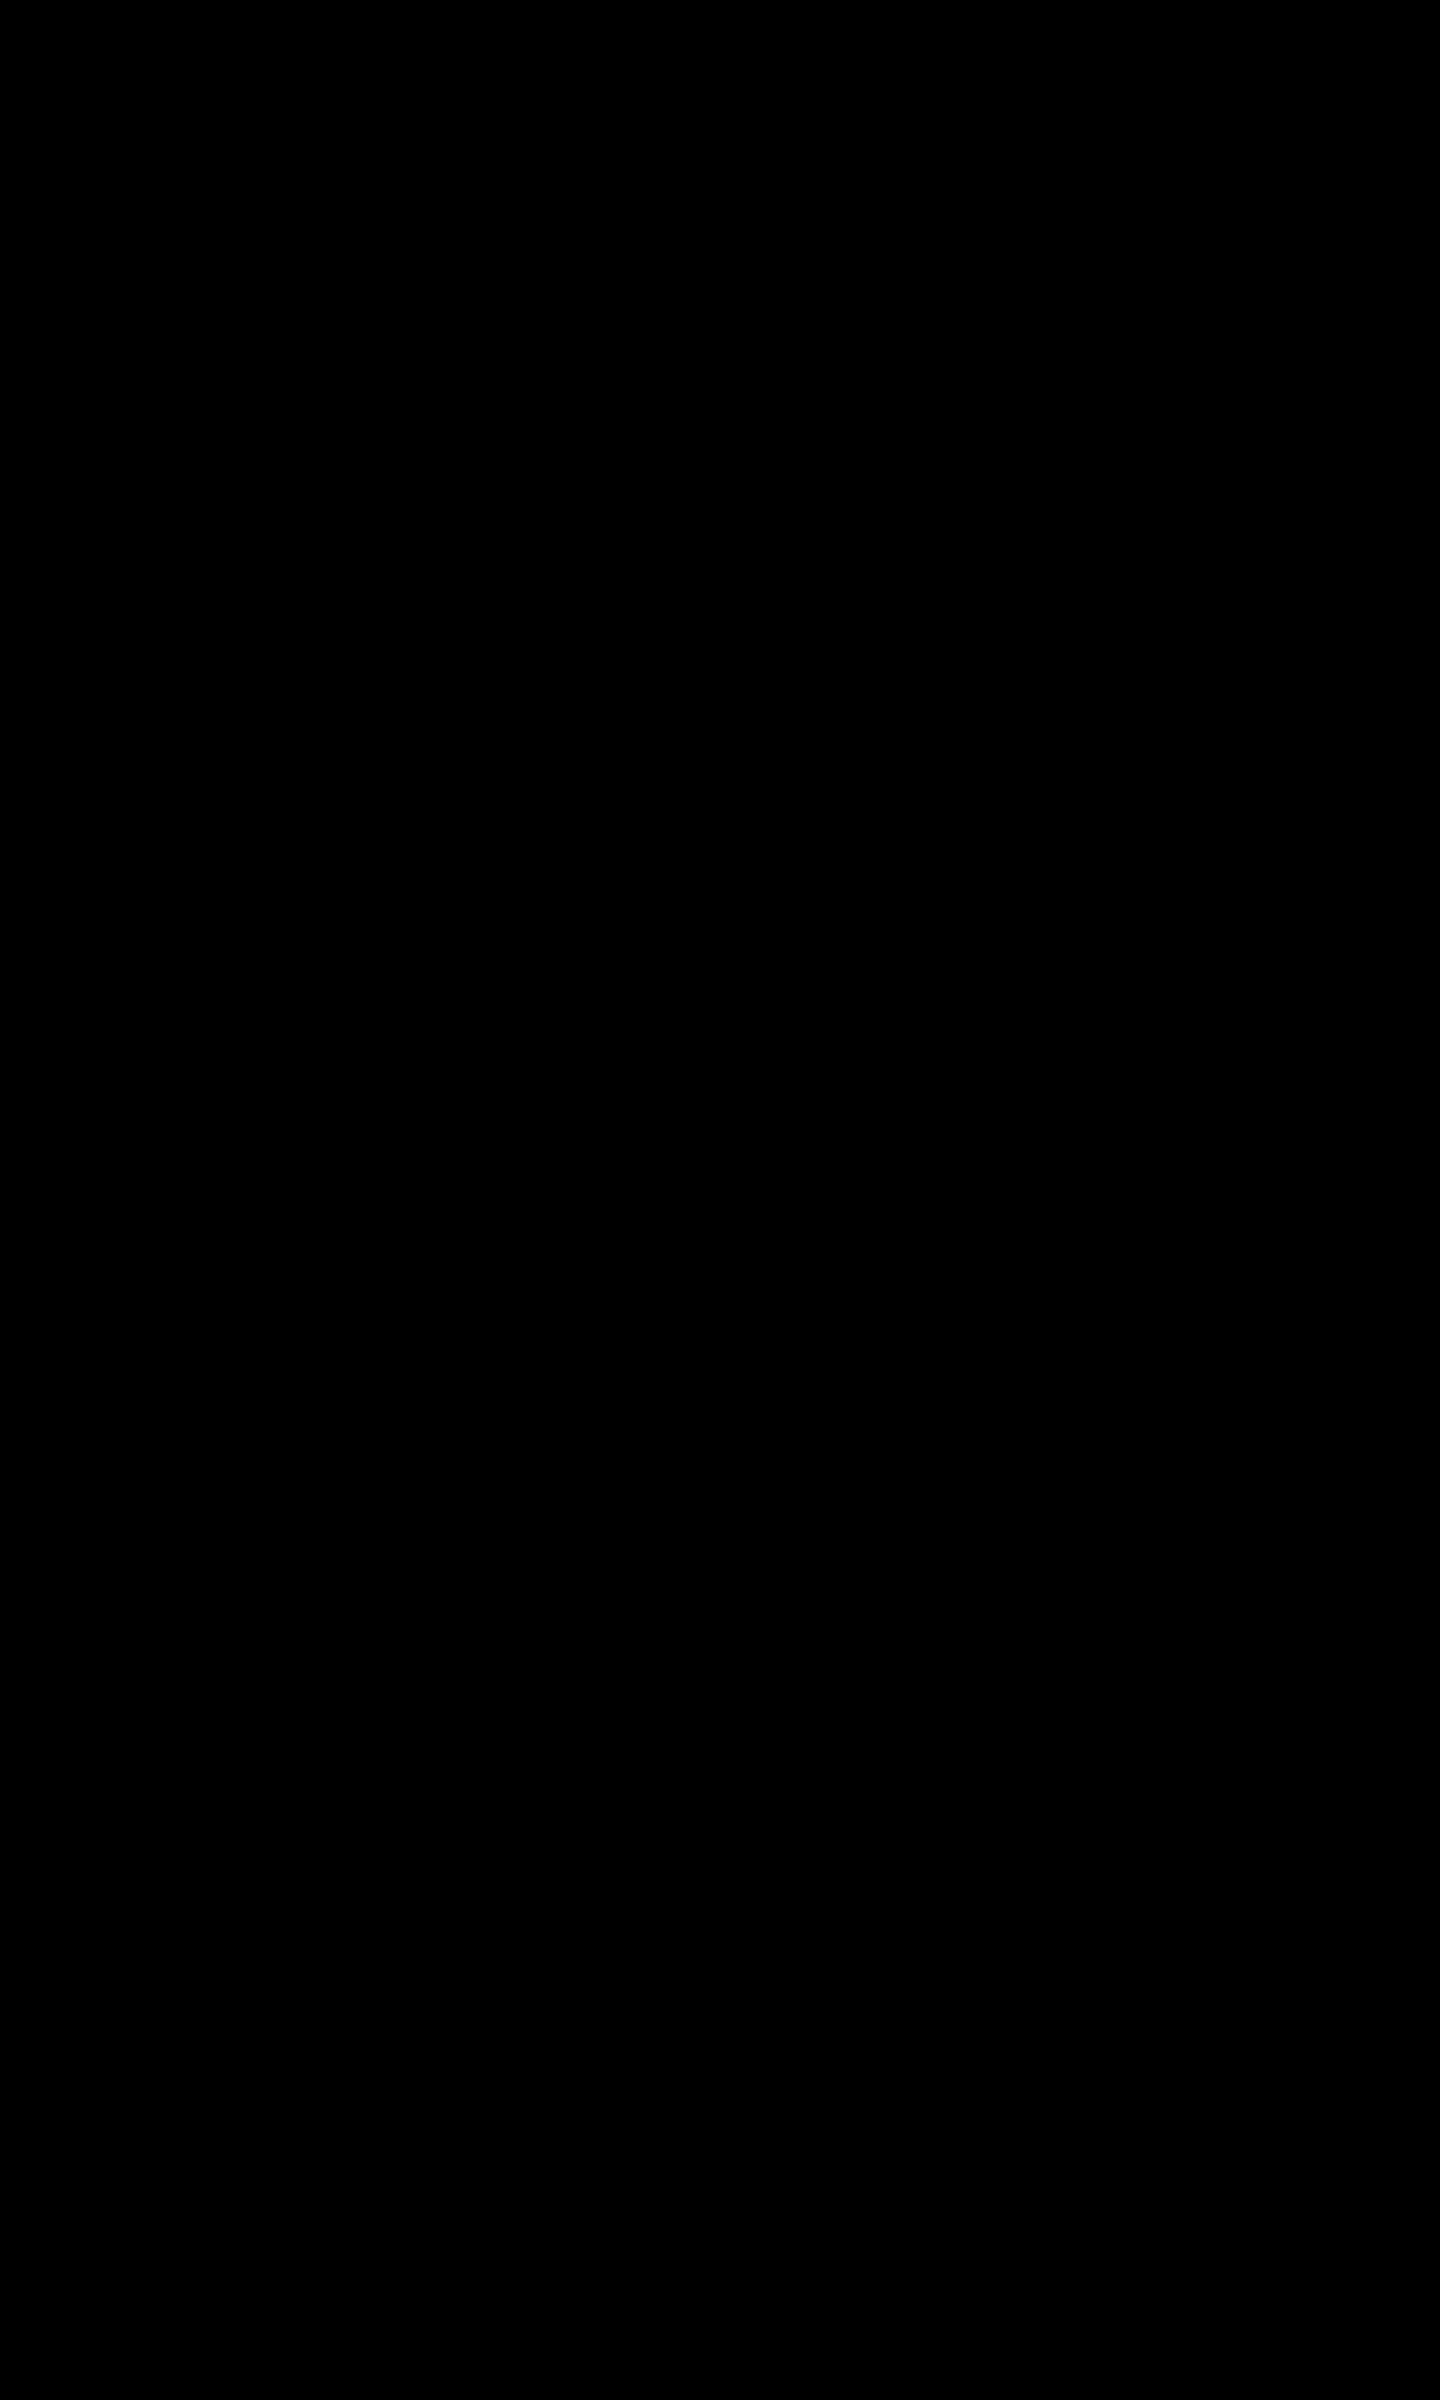 Line clipart line segment. Fourteen big image png